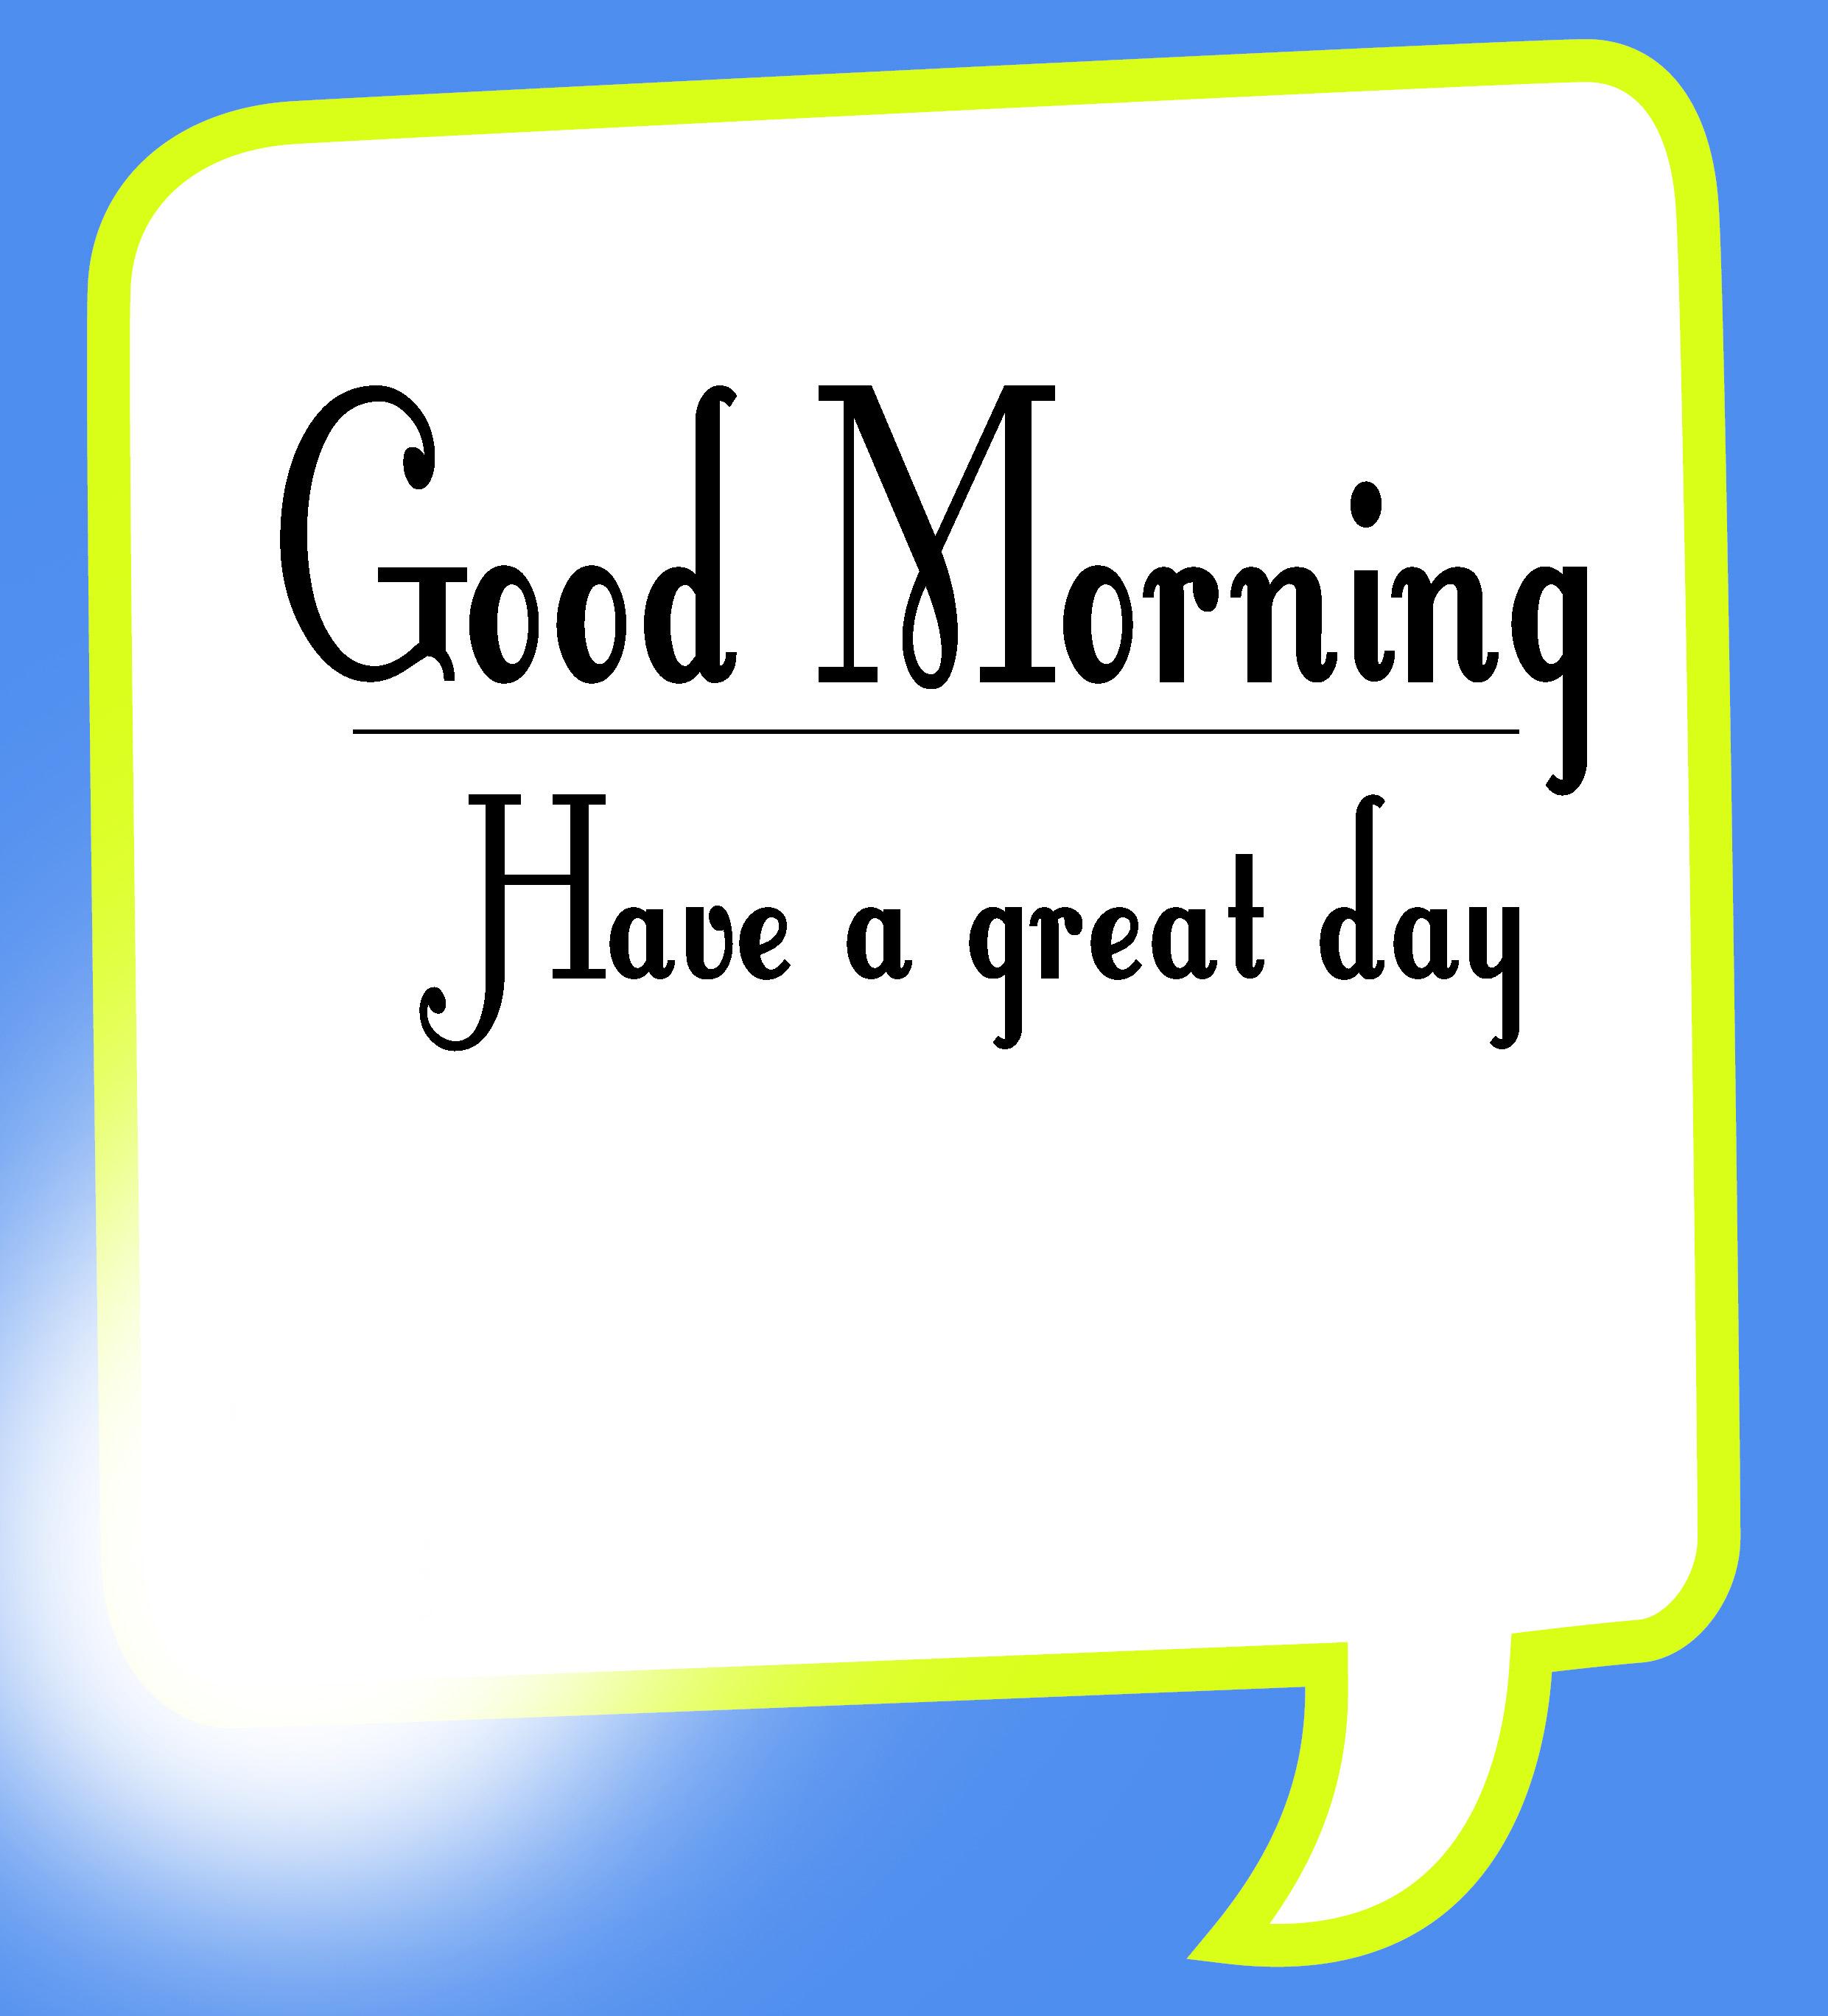 good morning postcard images Wallpaper HD